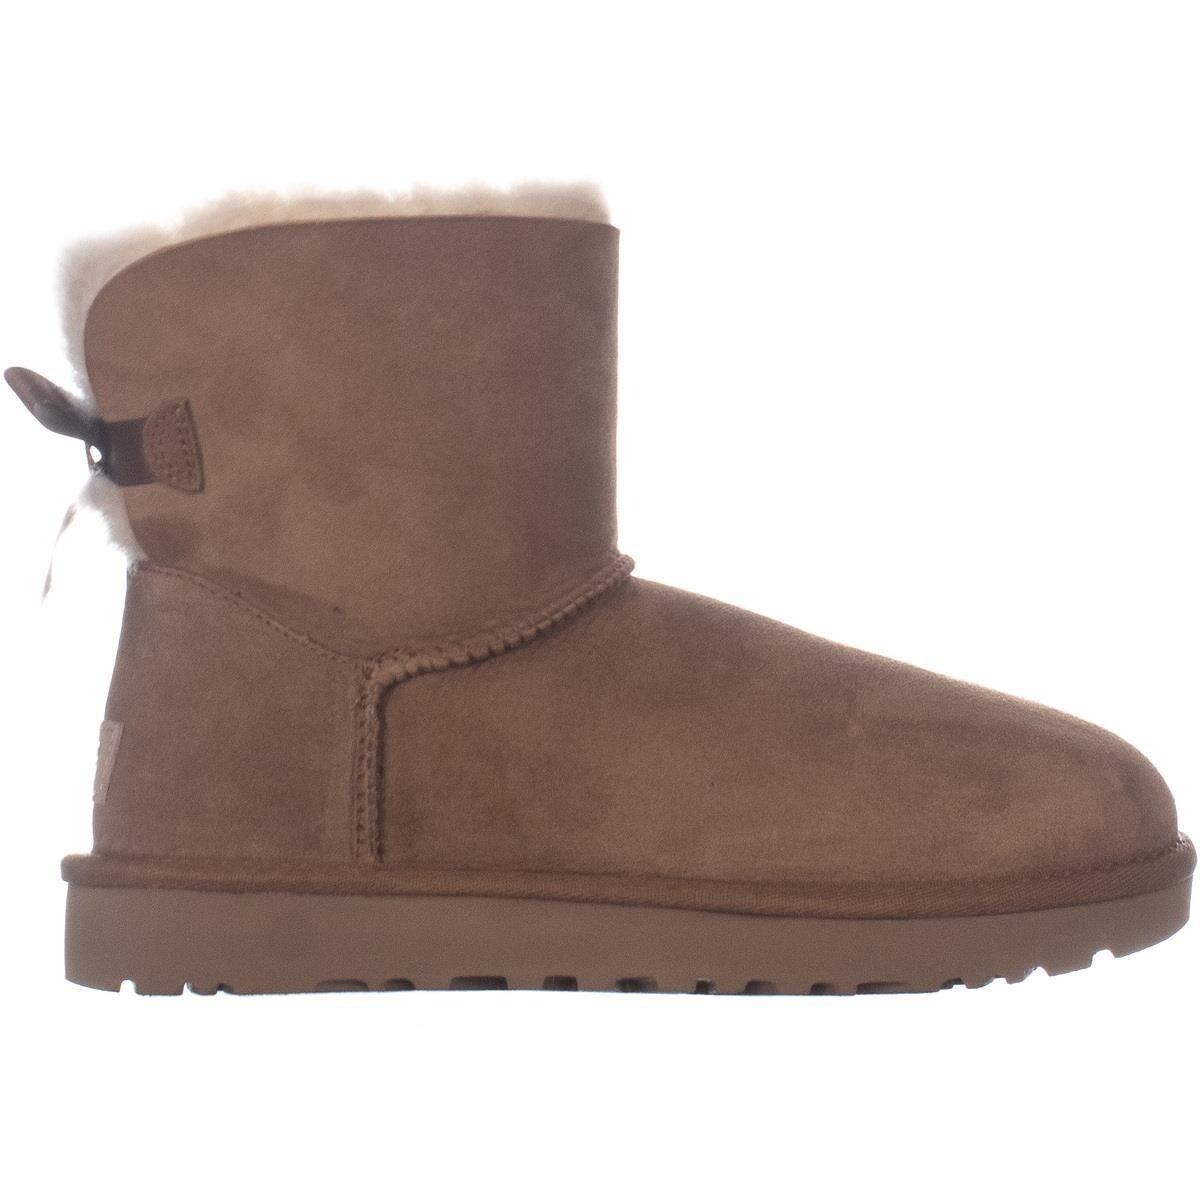 352f9c0b0ef UGG Mini Bailey Bow II Winter Boots, Chestnut - 7 US / 38 EU